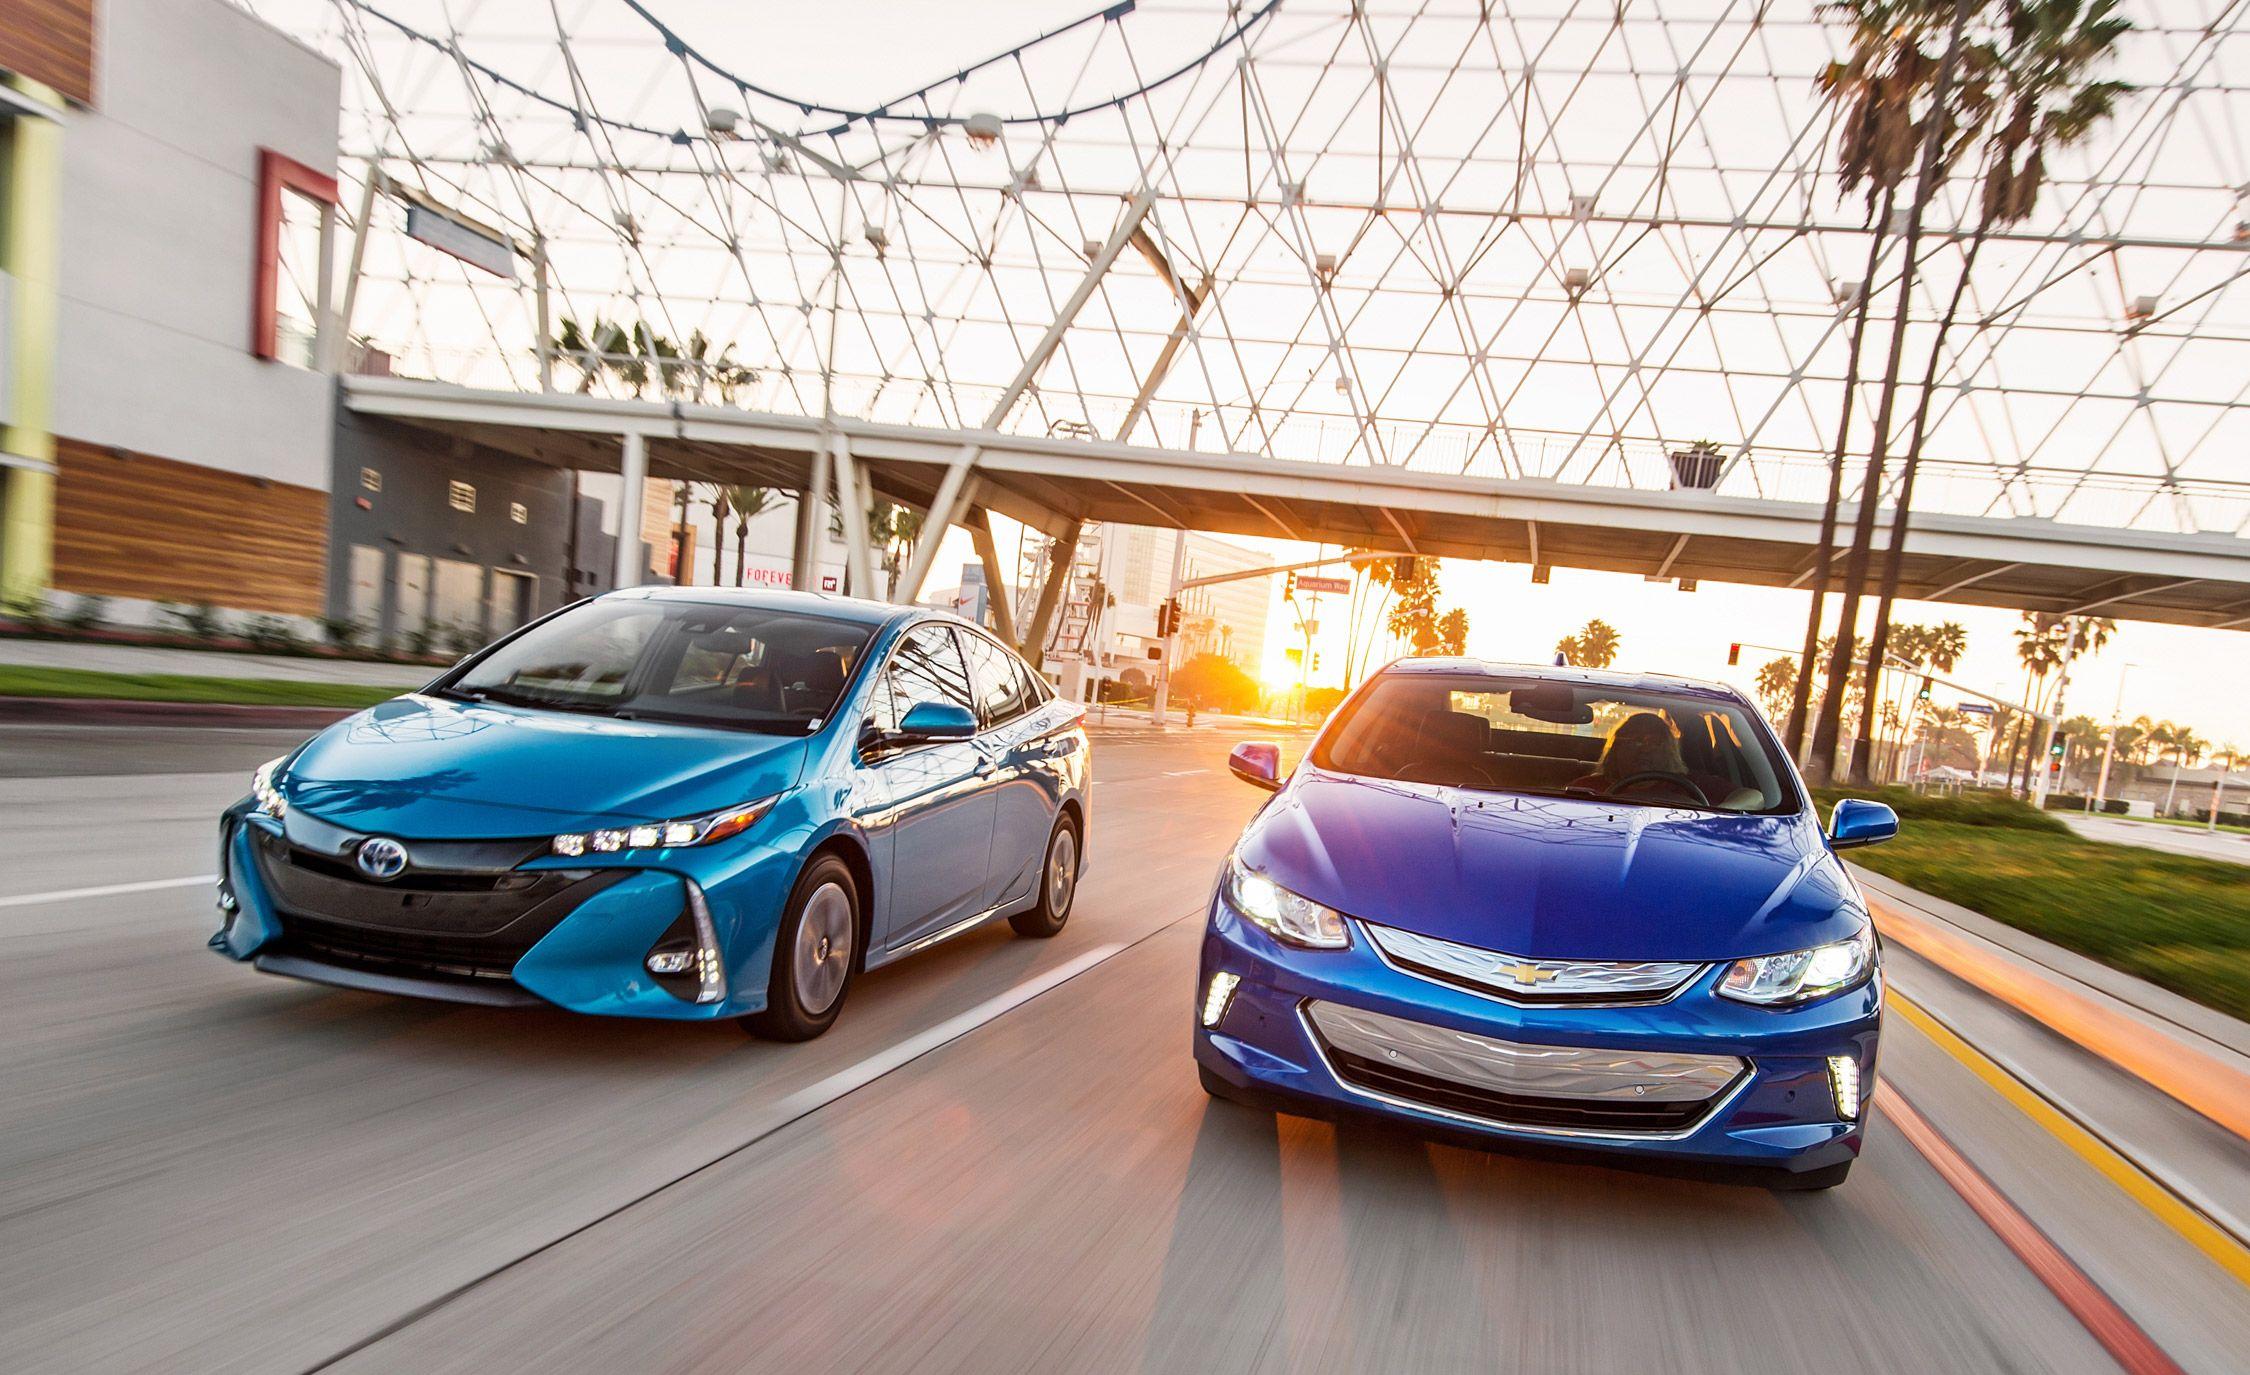 2017 Chevrolet Volt Premier Vs Toyota Prius Prime Advanced Comparison